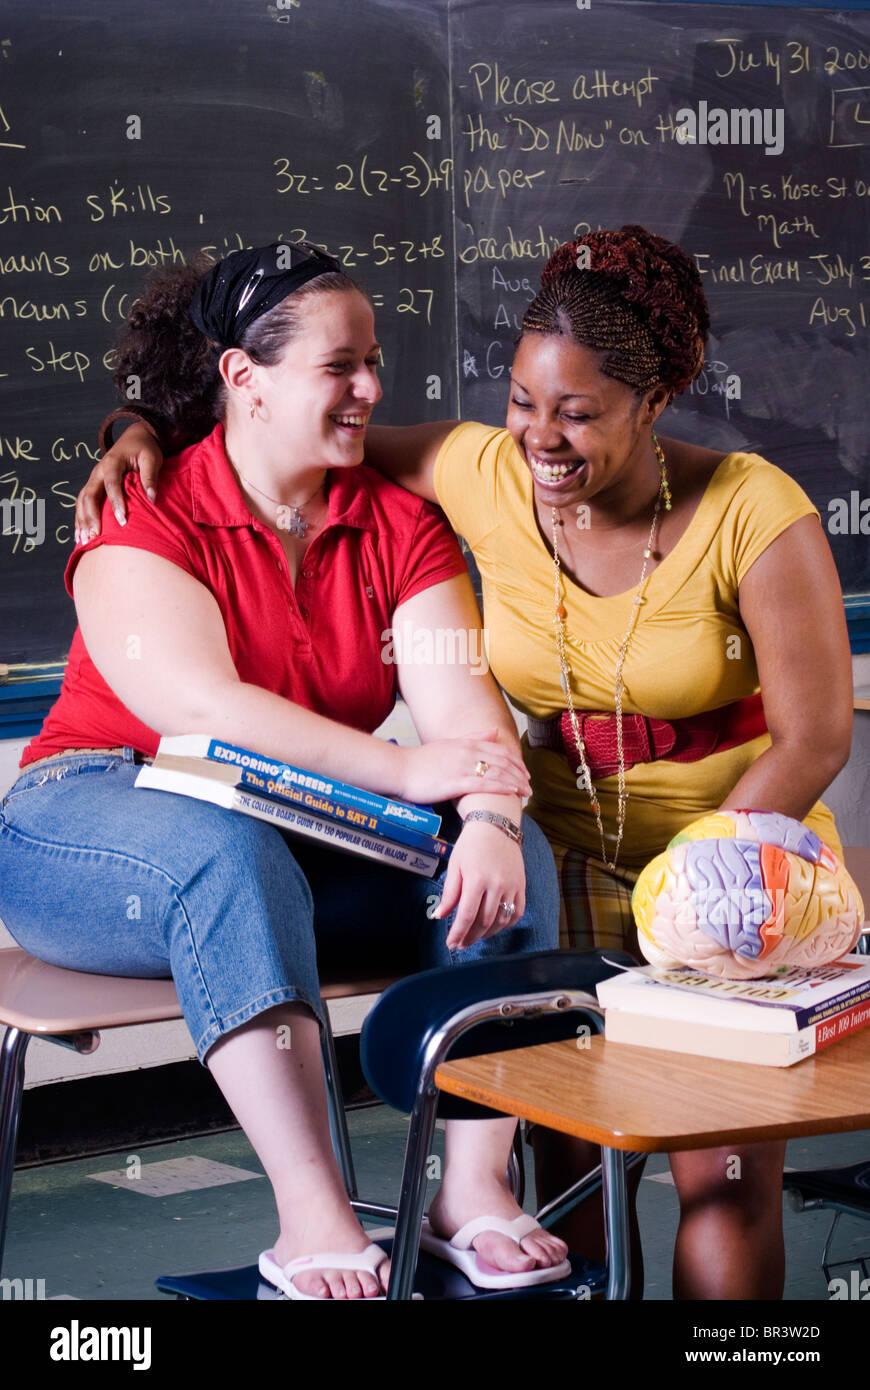 Mentoring program at Harding High School in Bridgeport CT helps seniors move on to college. - Stock Image